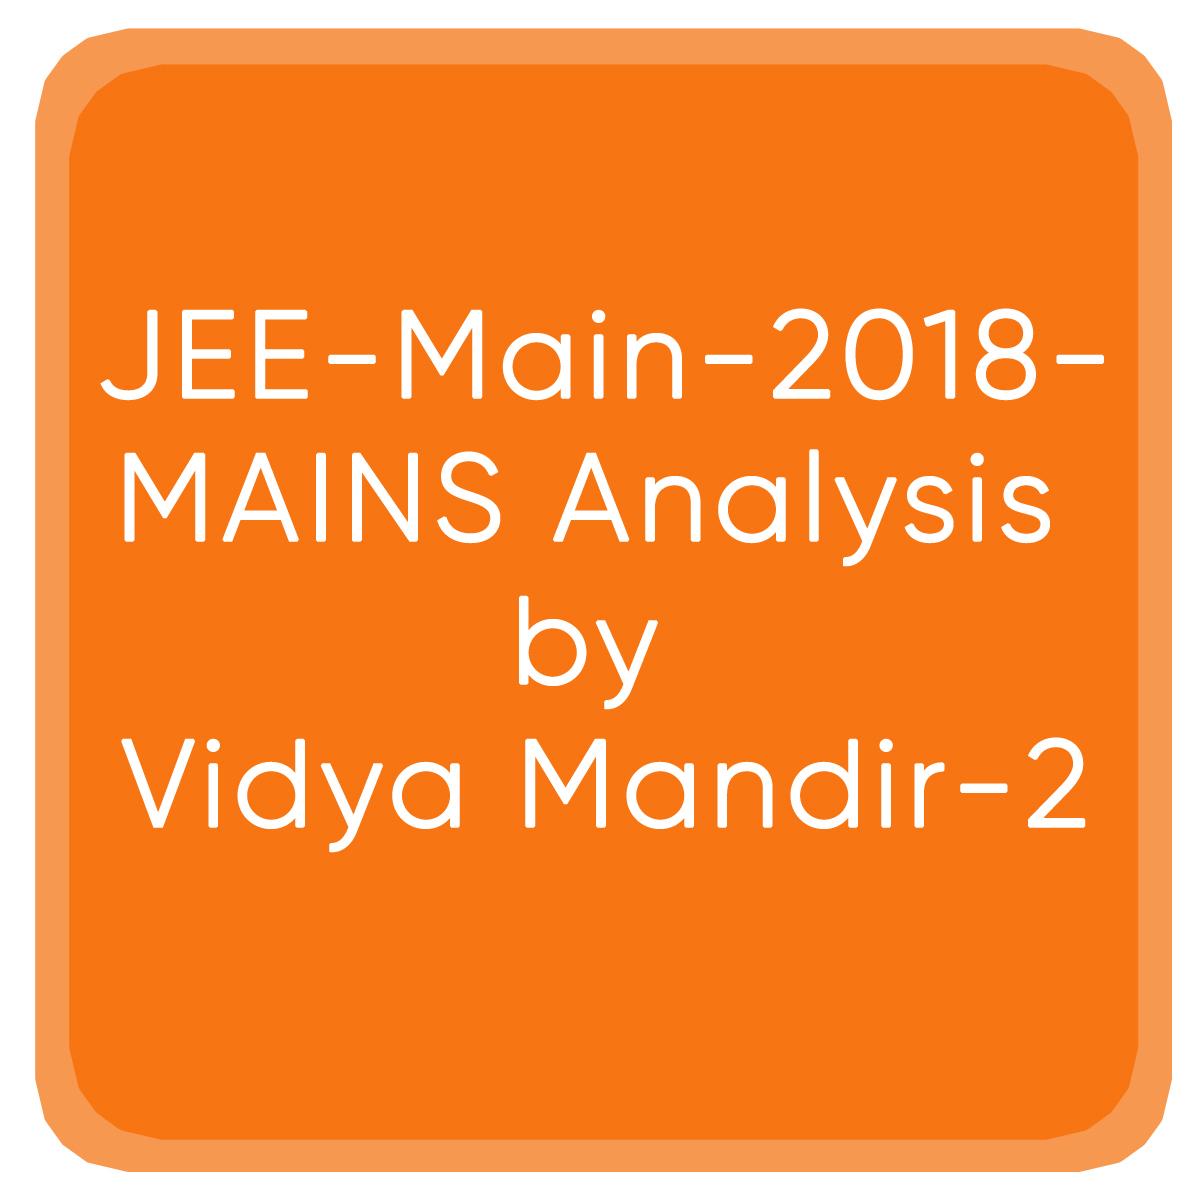 JEE-Main-2018-MAINS Analysis by Vidya Mandir-2